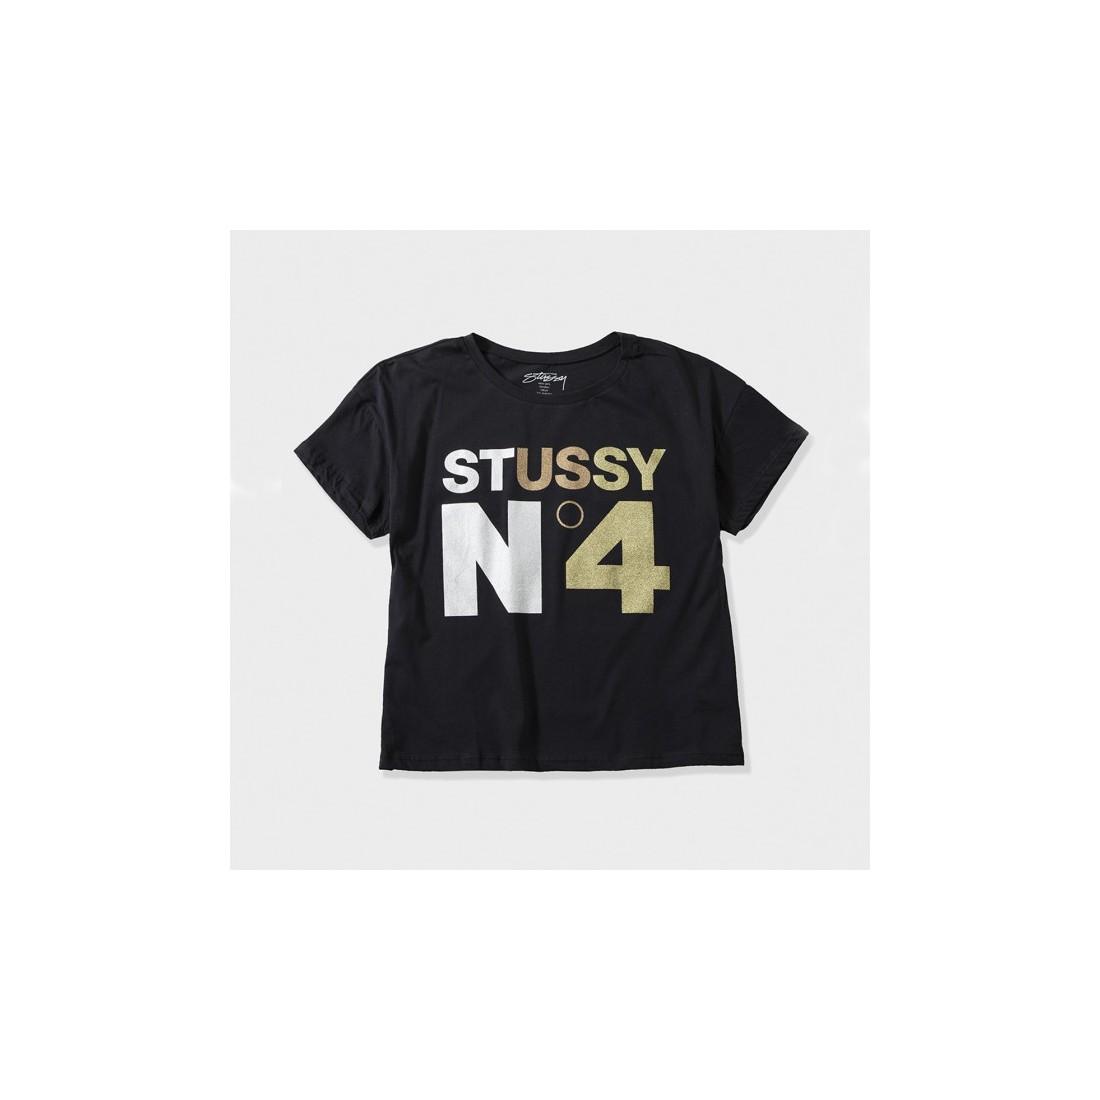 a510ebef58c Buy Stüssy women s tees Stüssy Metallic Nº4 Boxy tee black